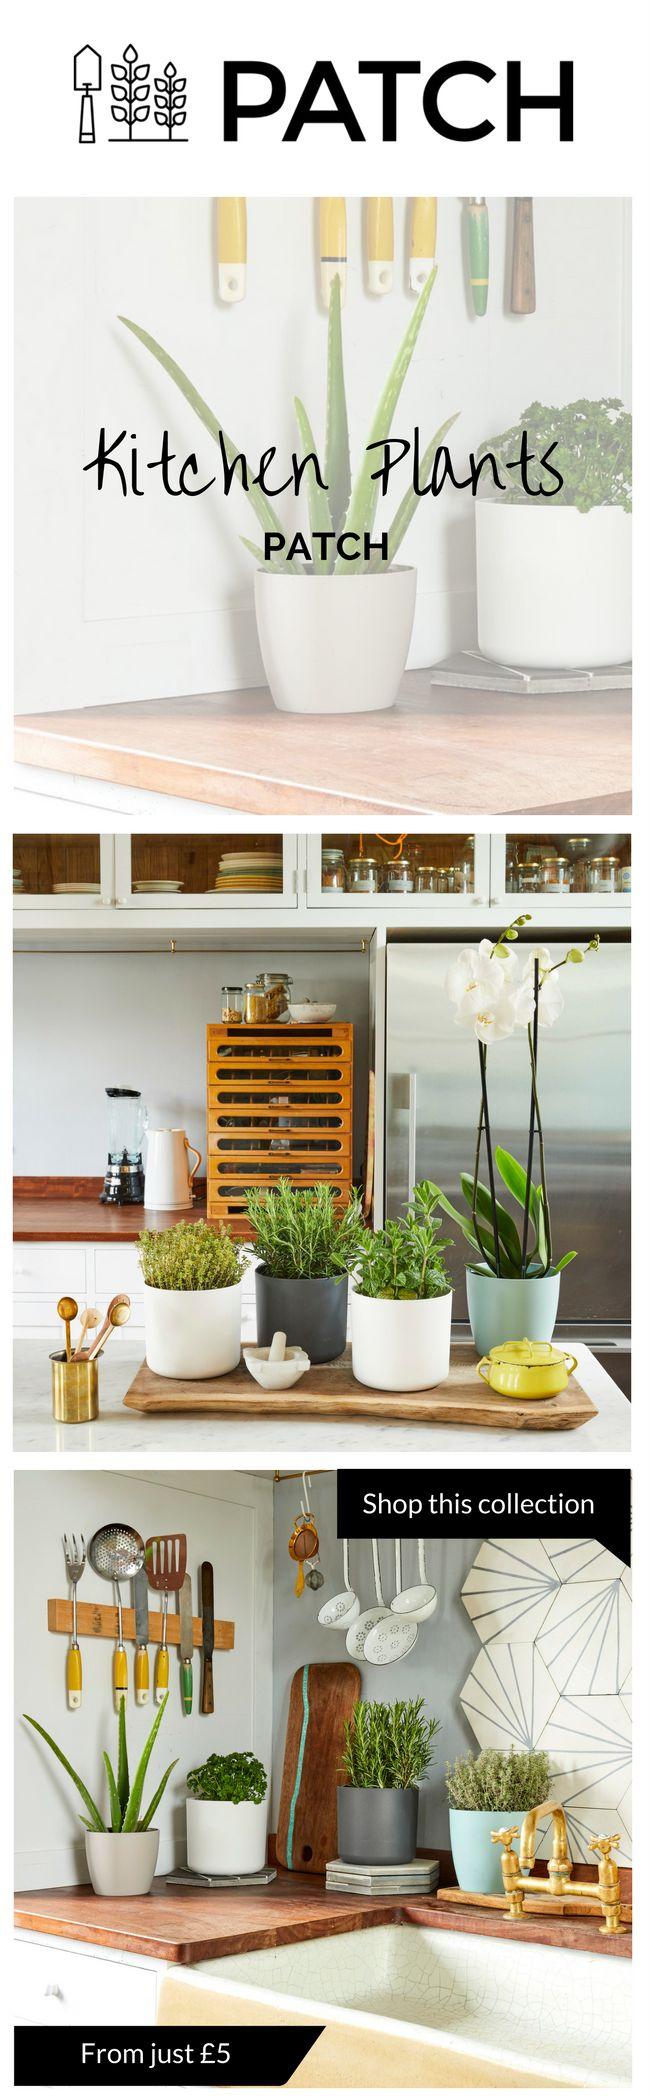 best kitchen images on pinterest arquitetura dream kitchens